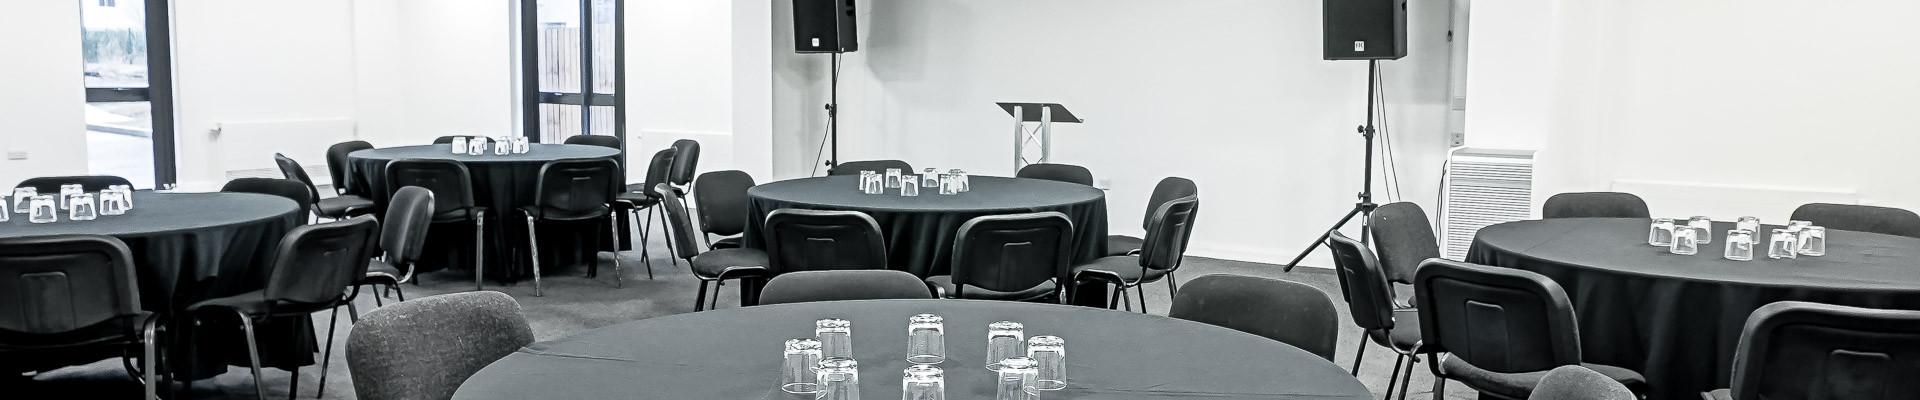 20150219 Conf Rooms-4.jpg